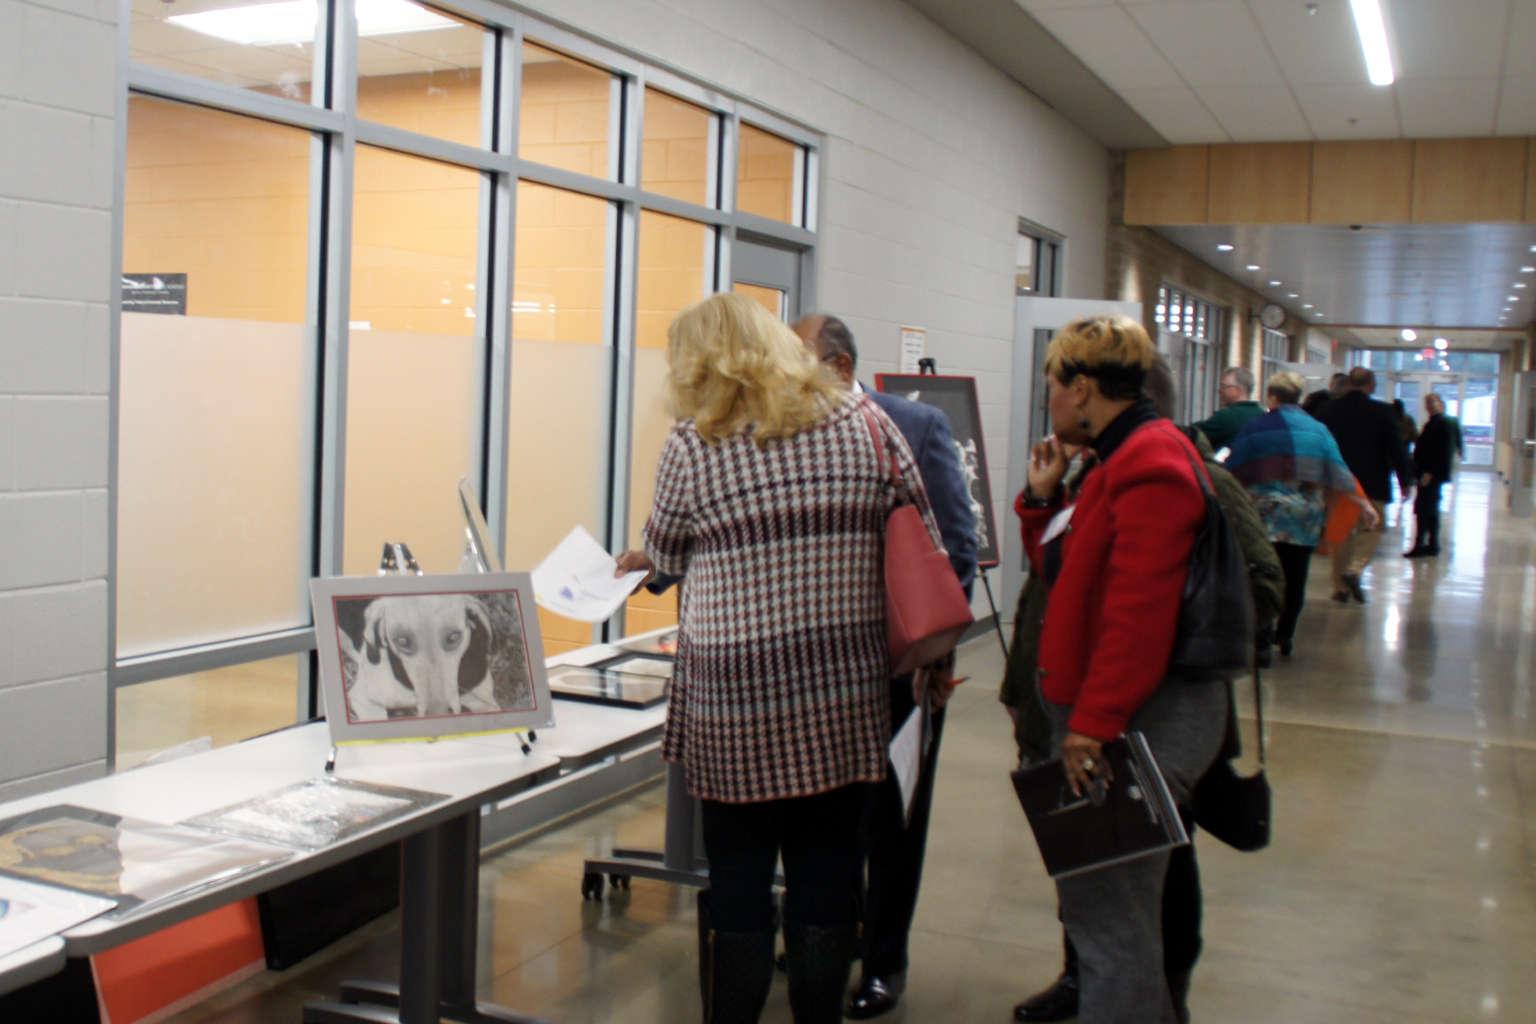 Art Judges viewing artwork at the Southside Regional Forum